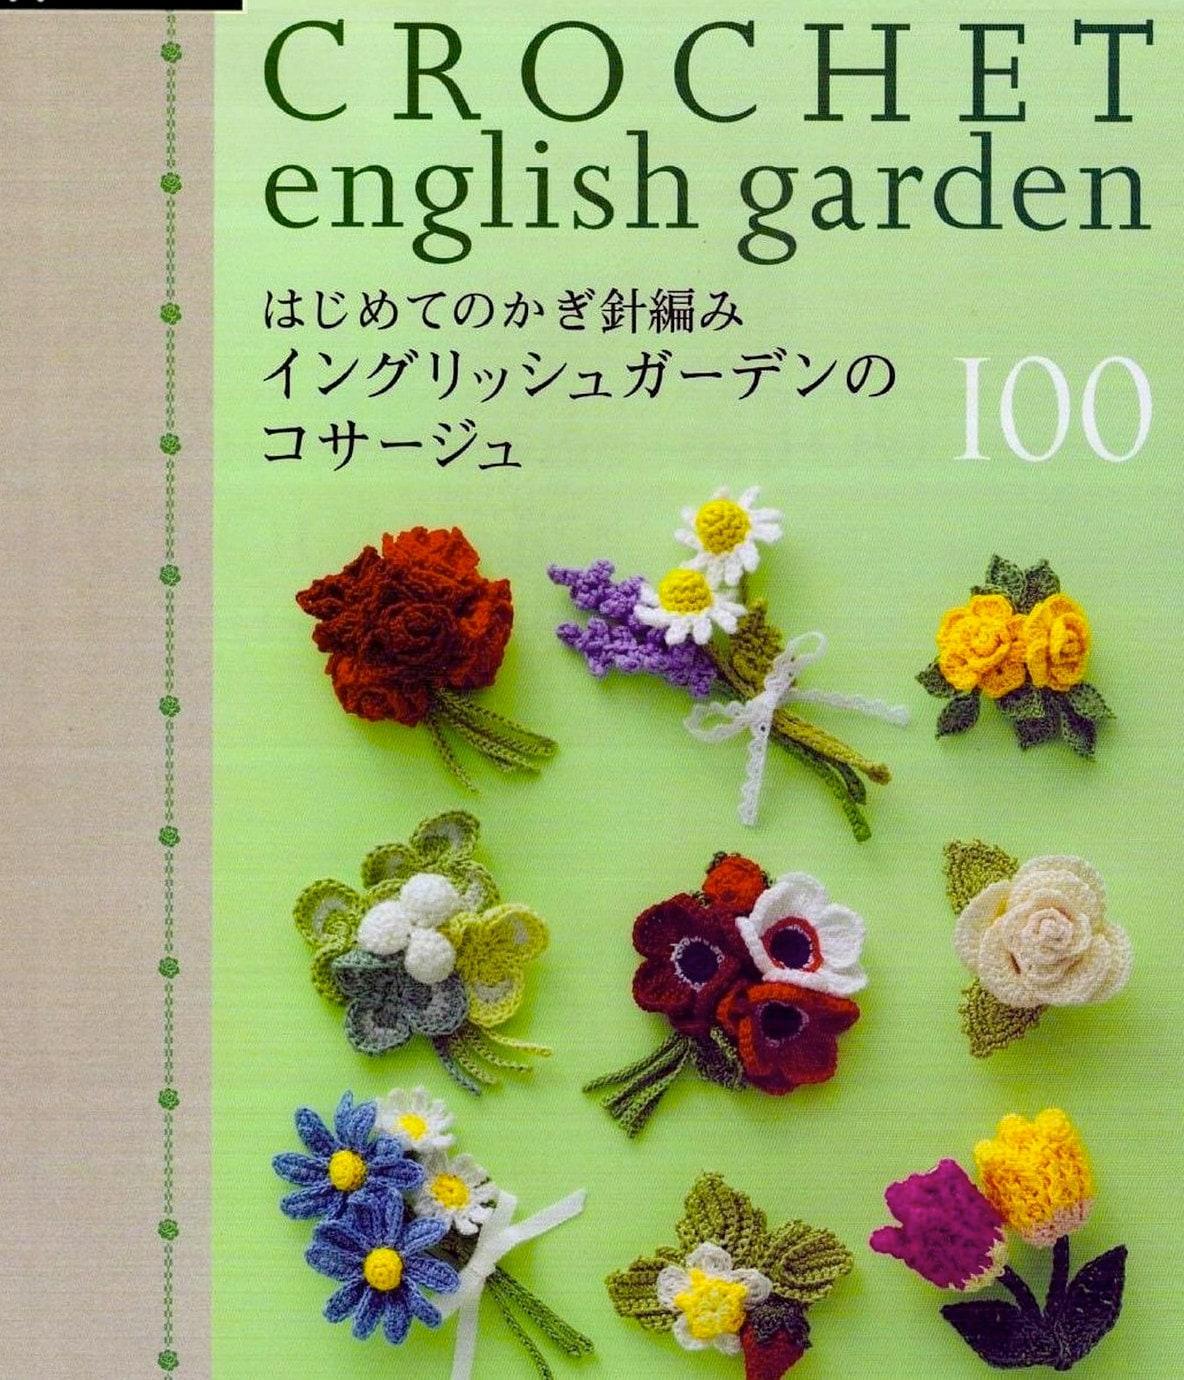 100 Flower Motif Patterns Japanese Crochet Book Pdf In Etsy